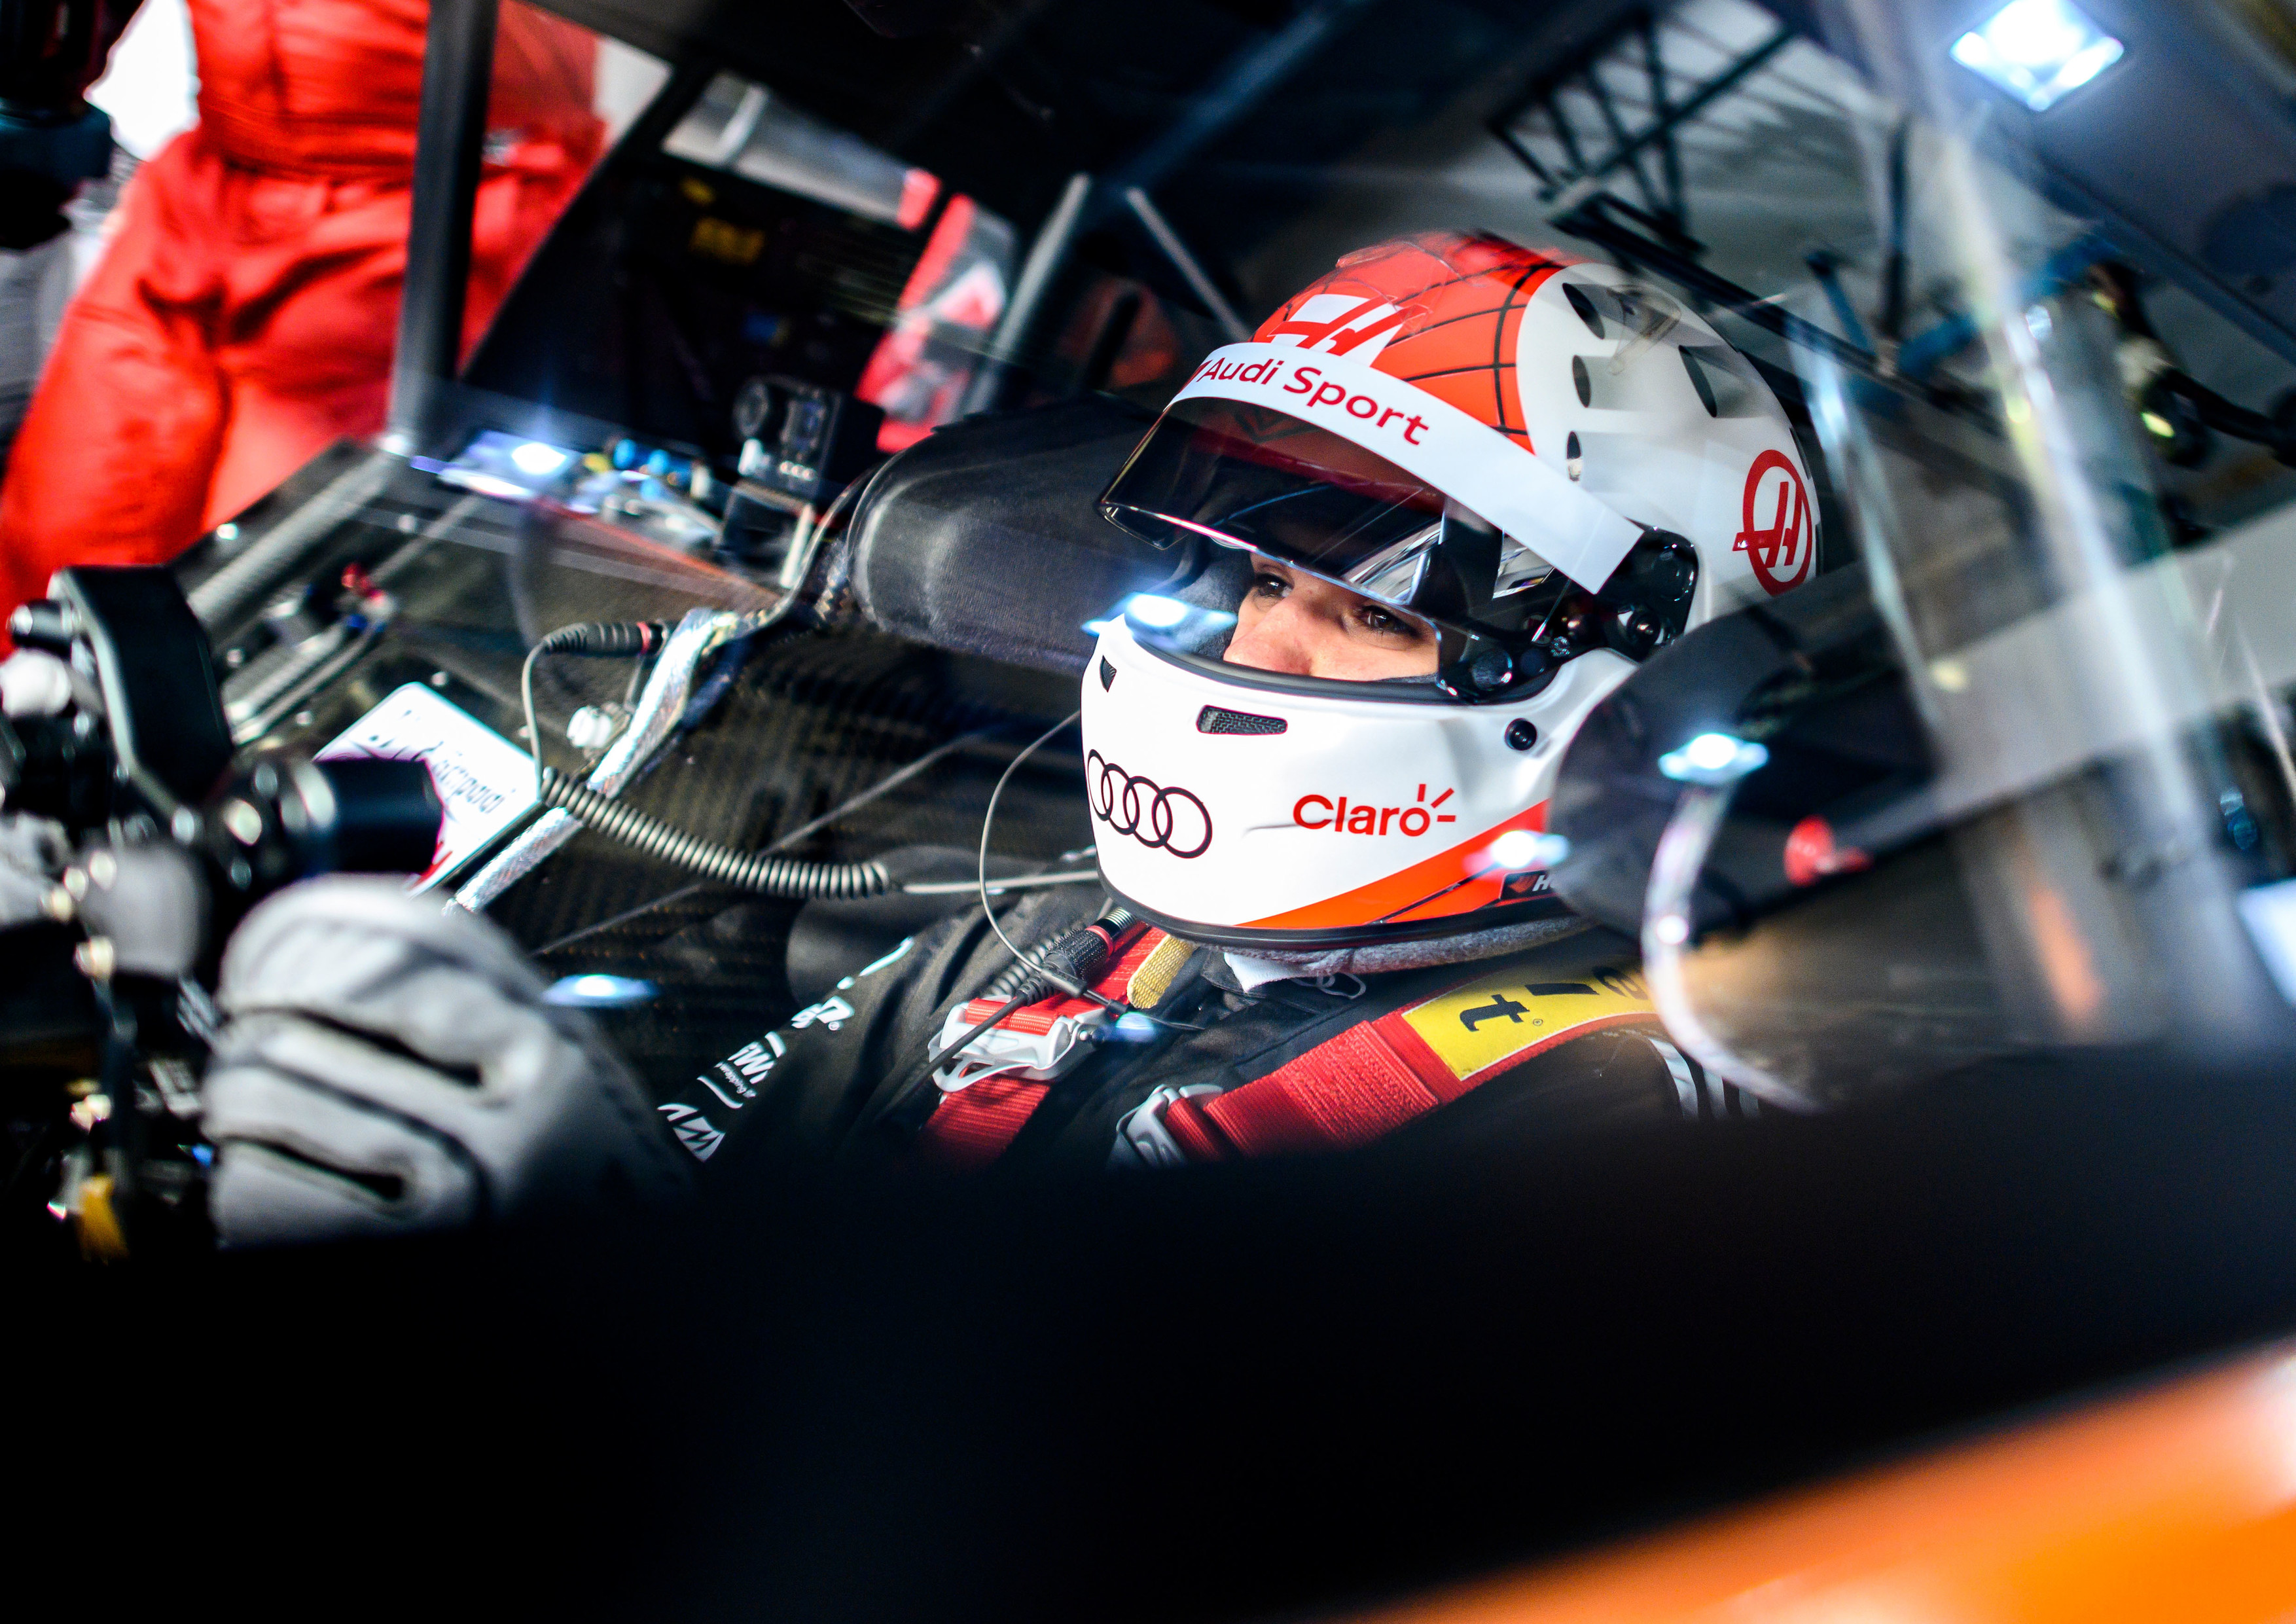 Photo of DTM – Pietro Fittipaldi conquista top-5 na DTM com a Audi em Misano